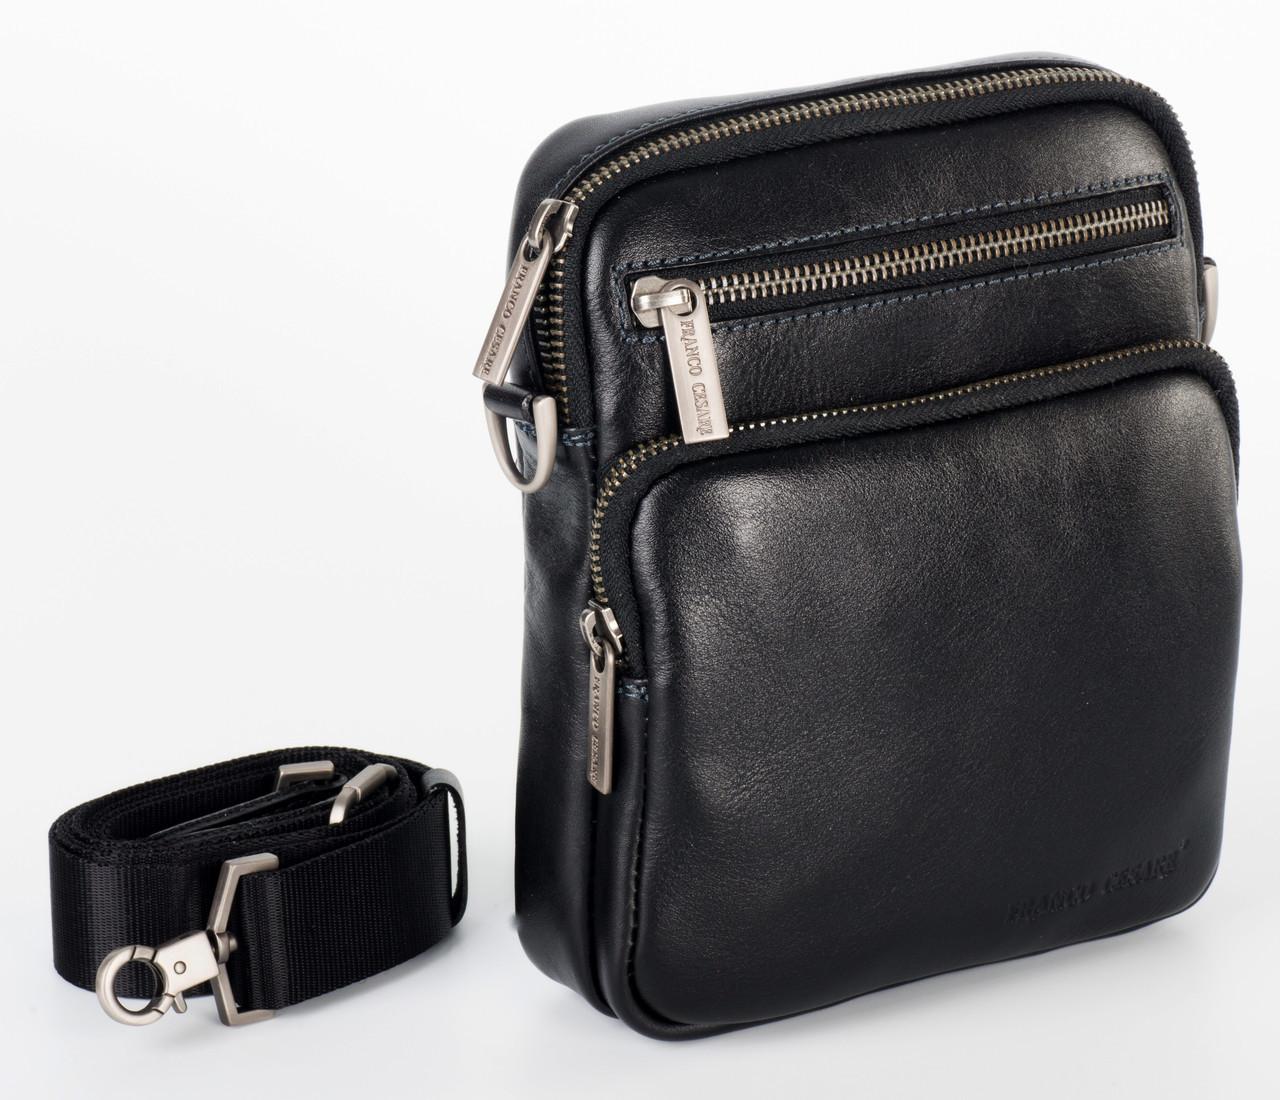 Кожаная малая сумка  FC-0359-L1 бренда FRANCO CESARE